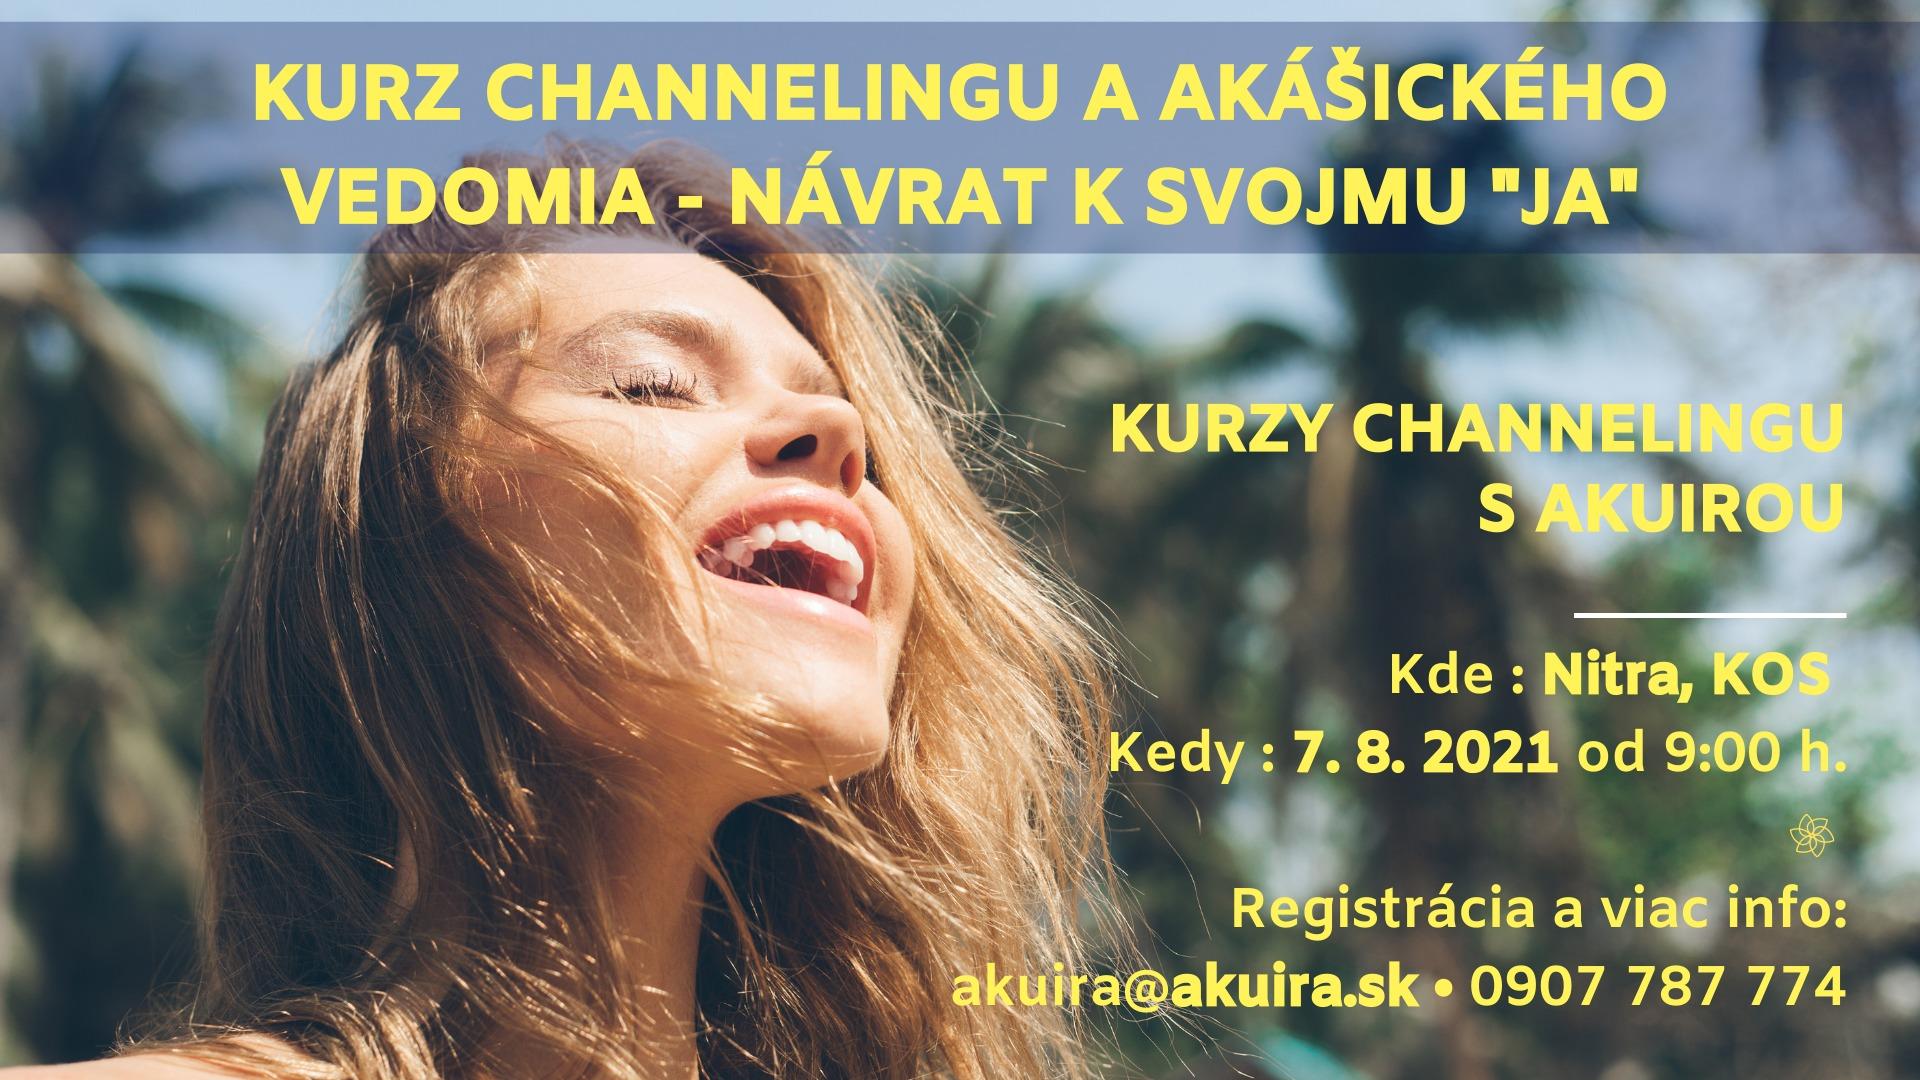 Kurz channeling 7. august 2021 Nitra Akuira.sk